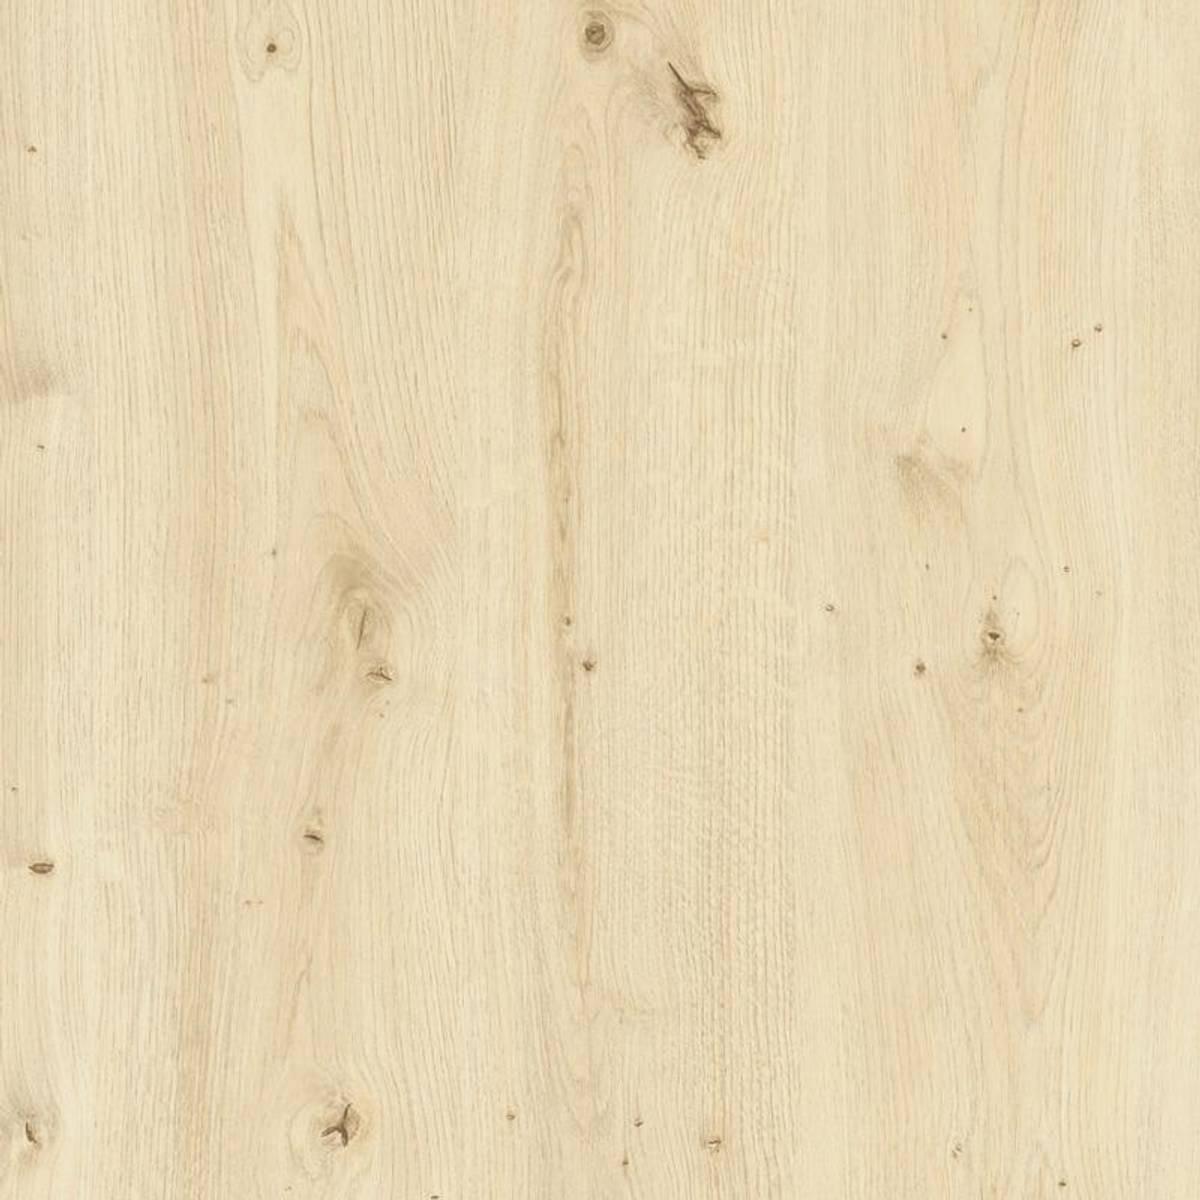 Vareprøve: Scandinavian Oak kontaktplast